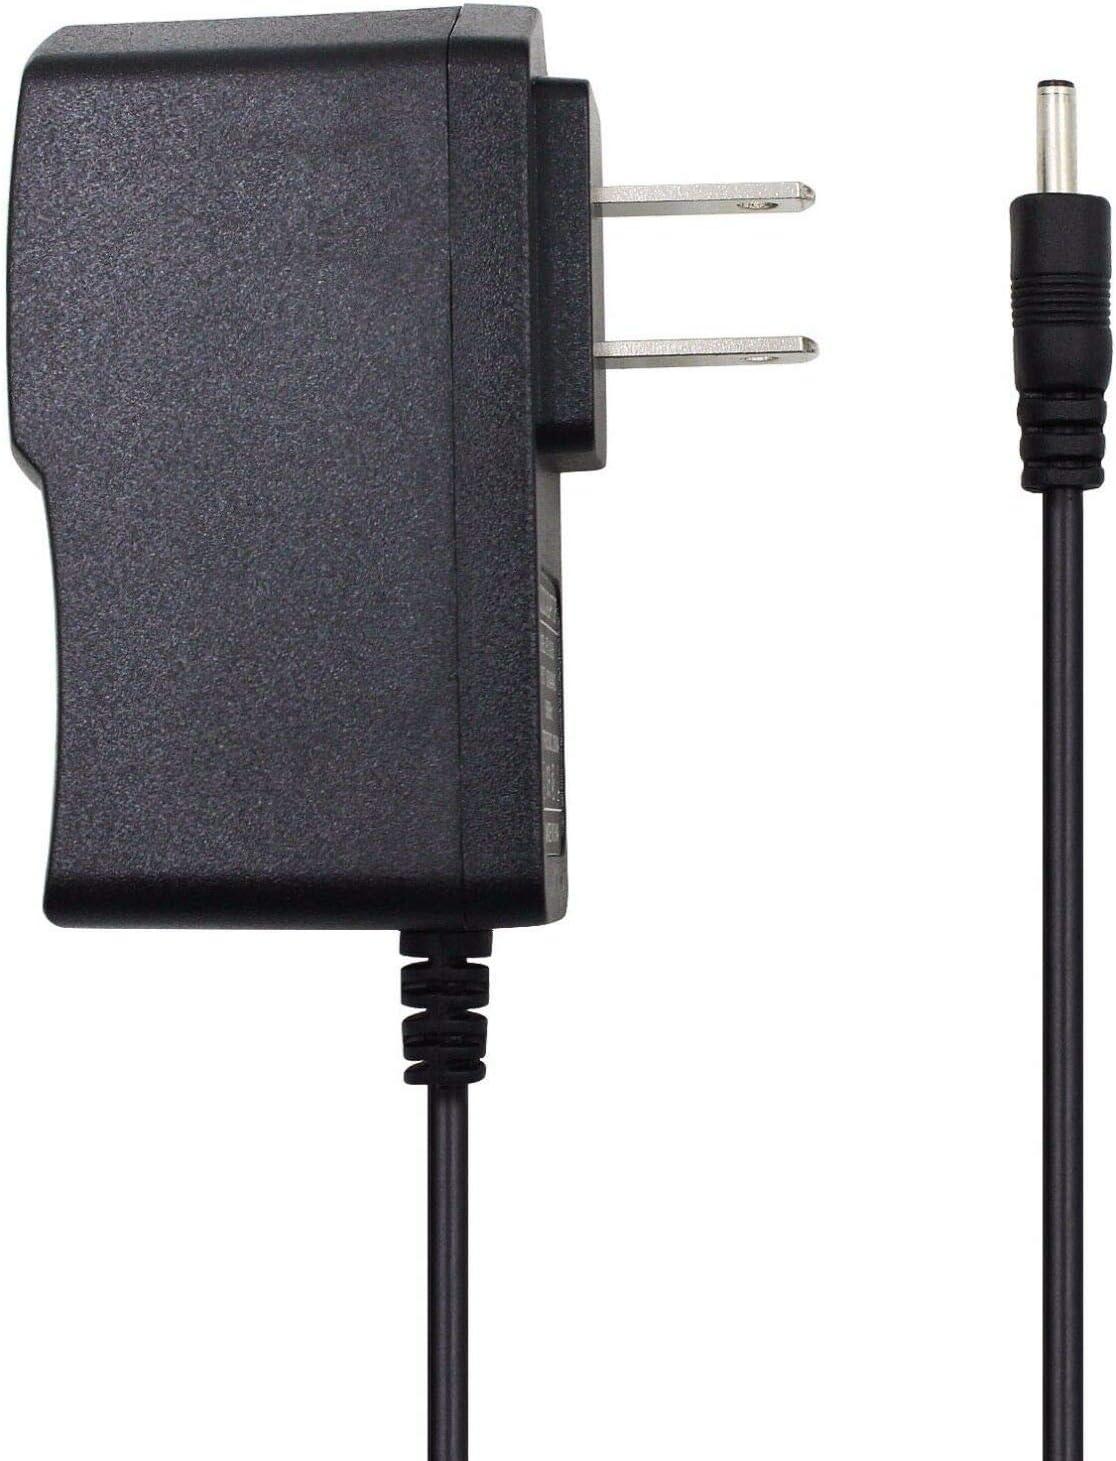 AC//DC Adapter for Kodak Zi8 Zx1 ZxD ES-ONE 6MP Digital Video Camera Power